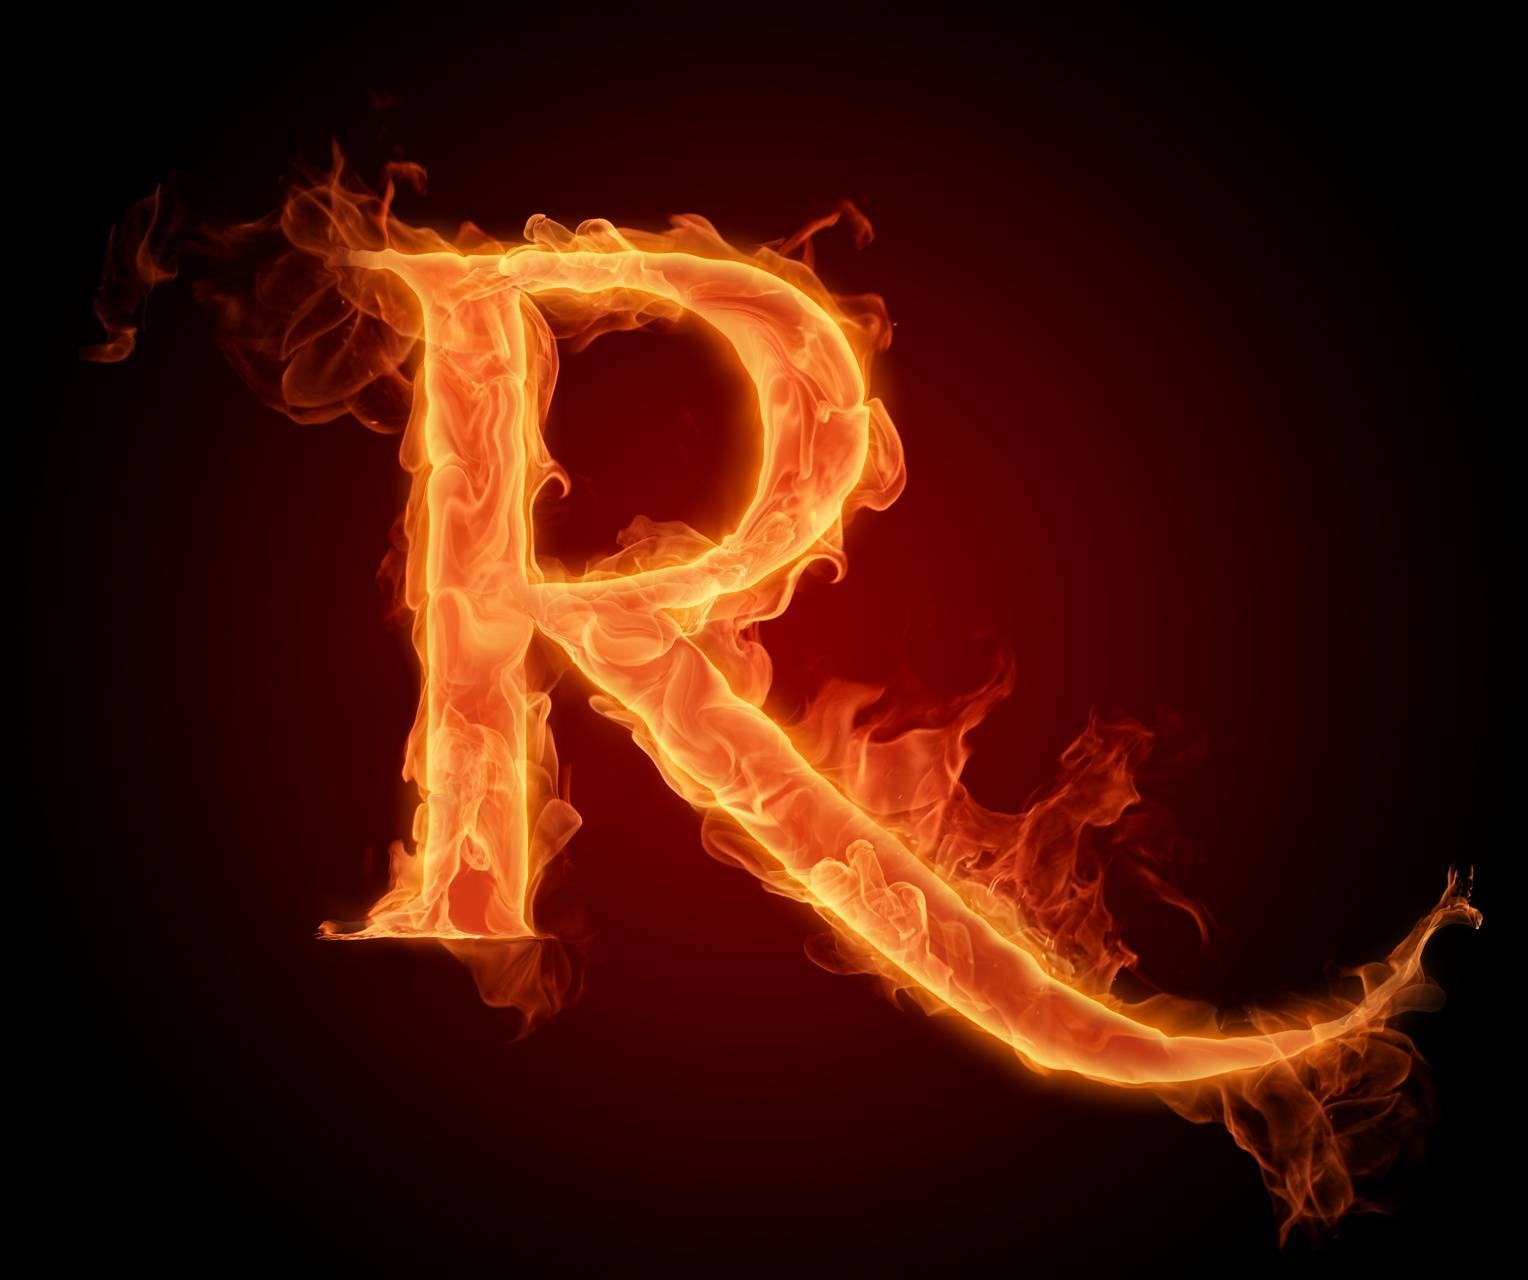 Words Fire